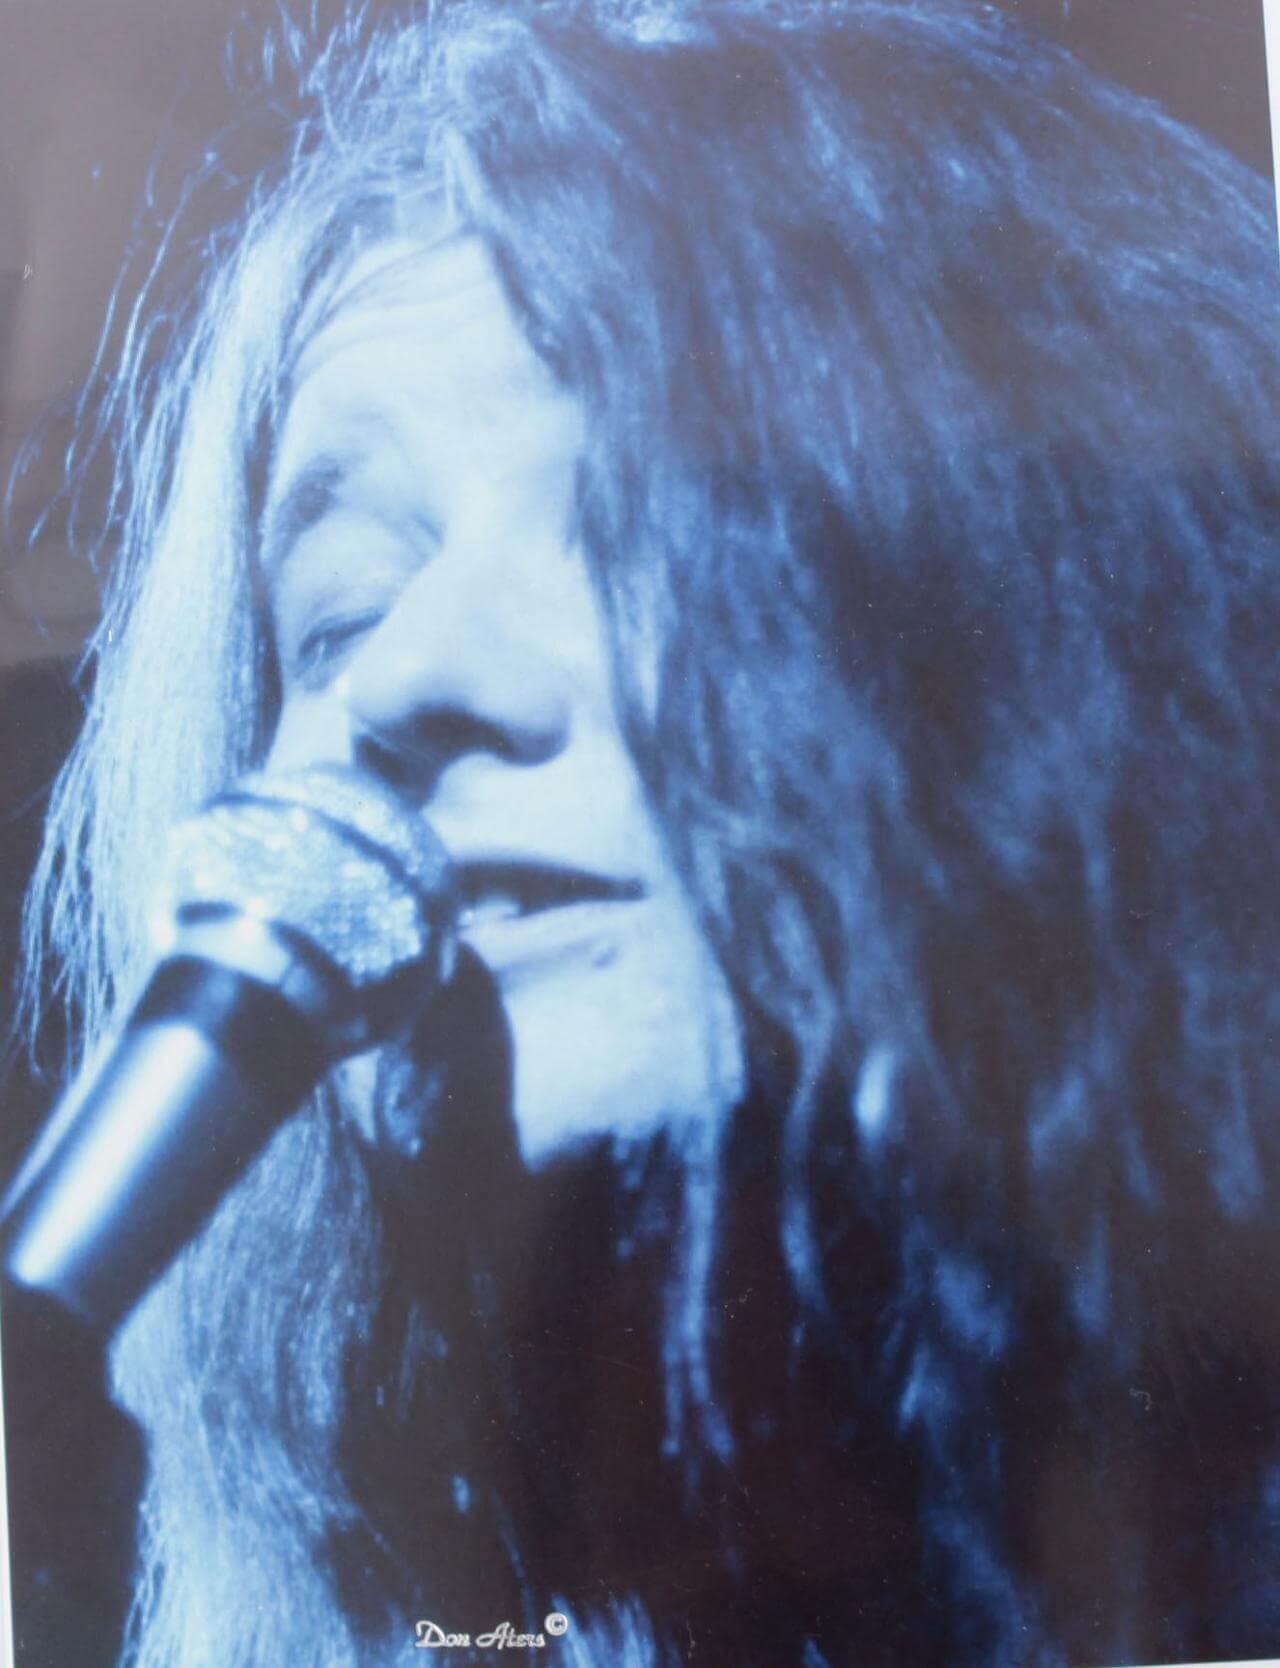 Janis Joplin 8x10 Headshot Photo (Don Aters Seal)